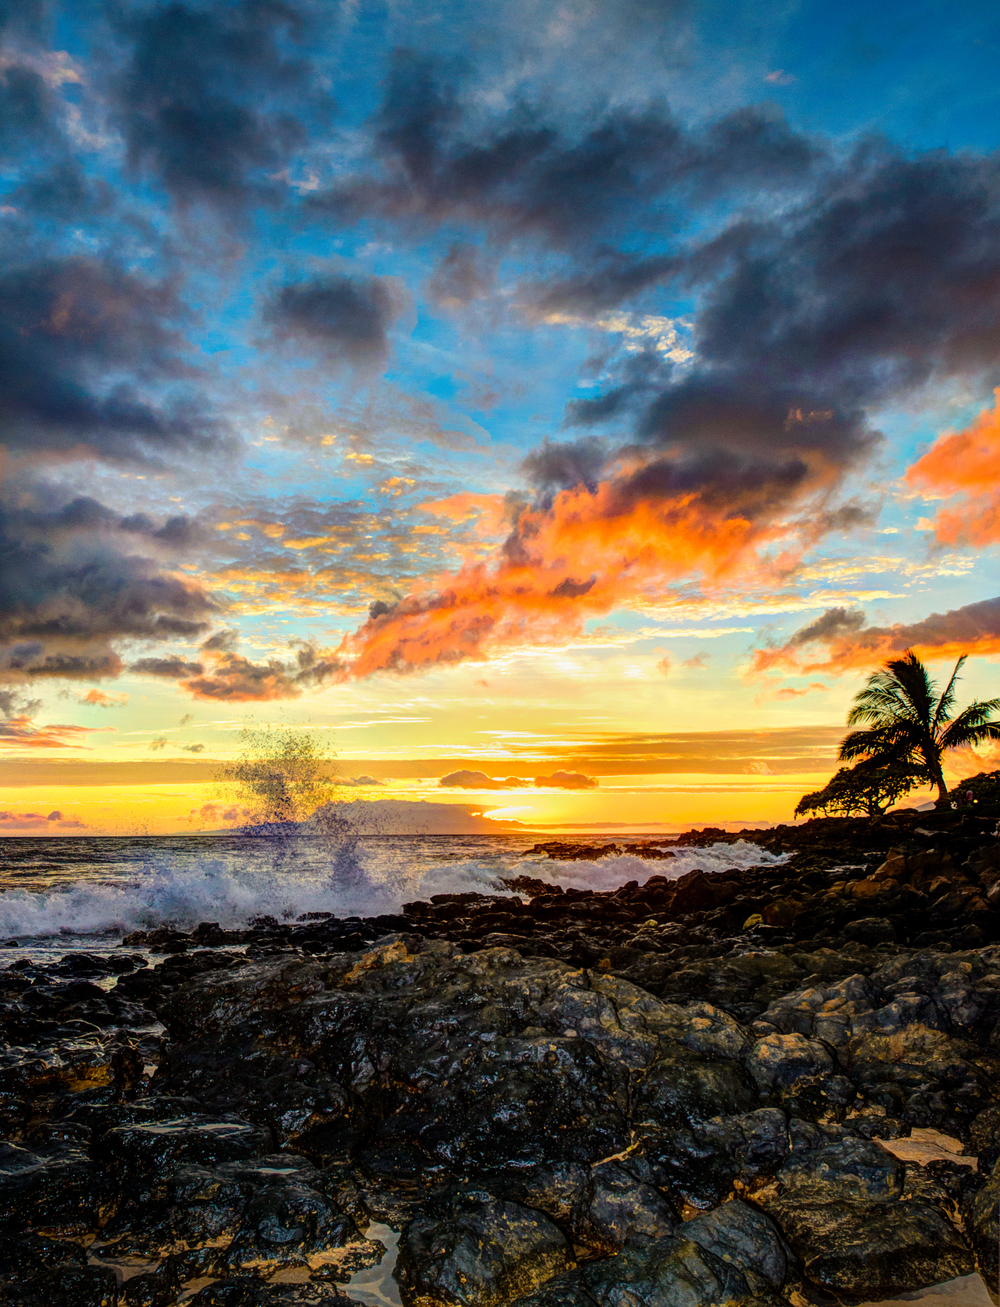 Maui Vacation DSC_8017_8_9photomatix.jpg